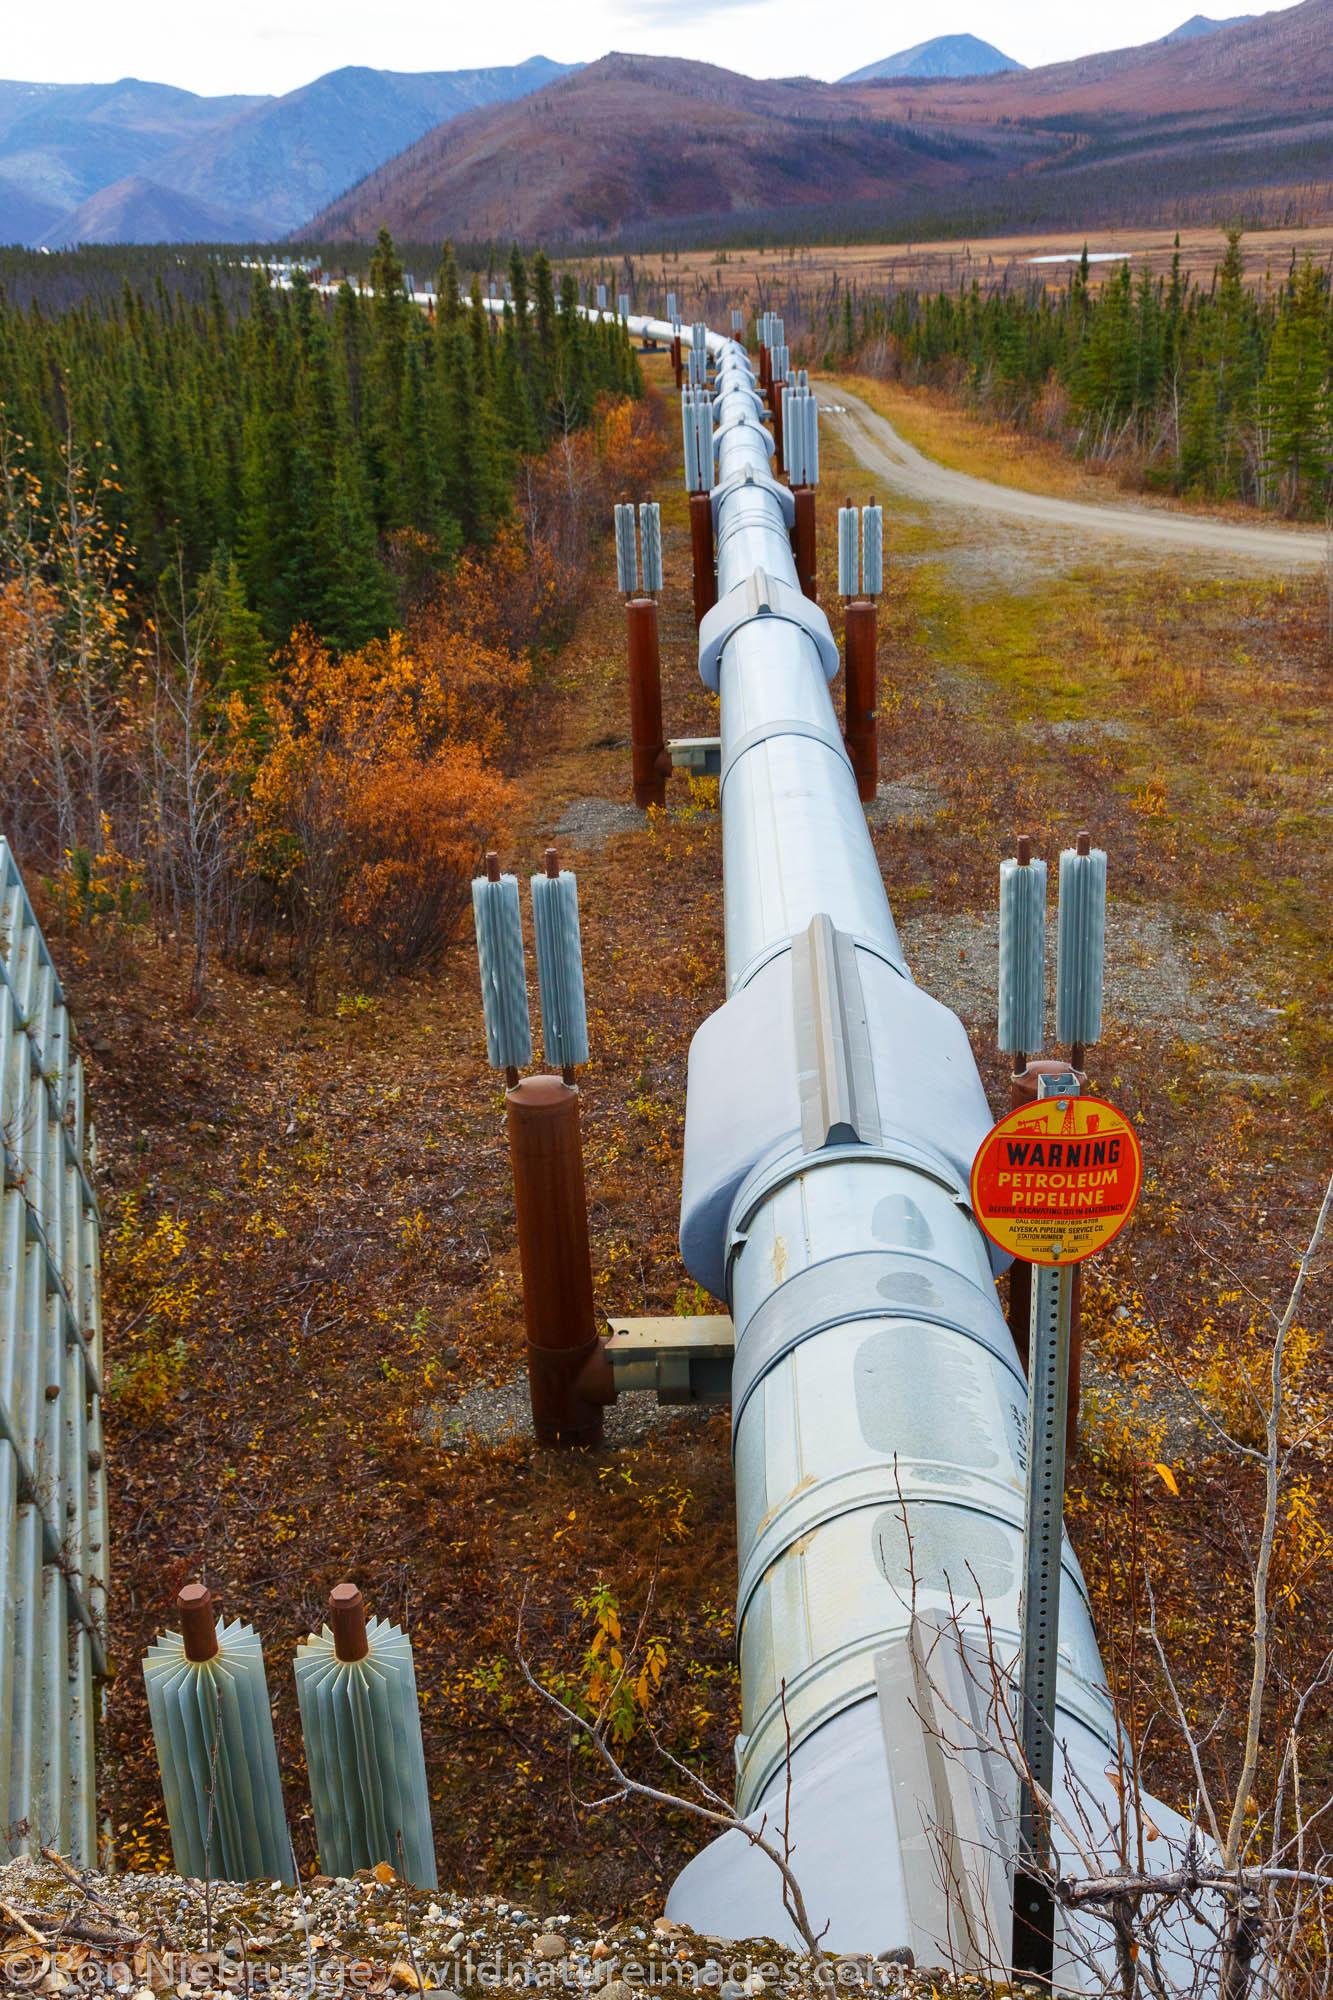 Alyeska Pipeline near the Dalton Highway, Alaska.